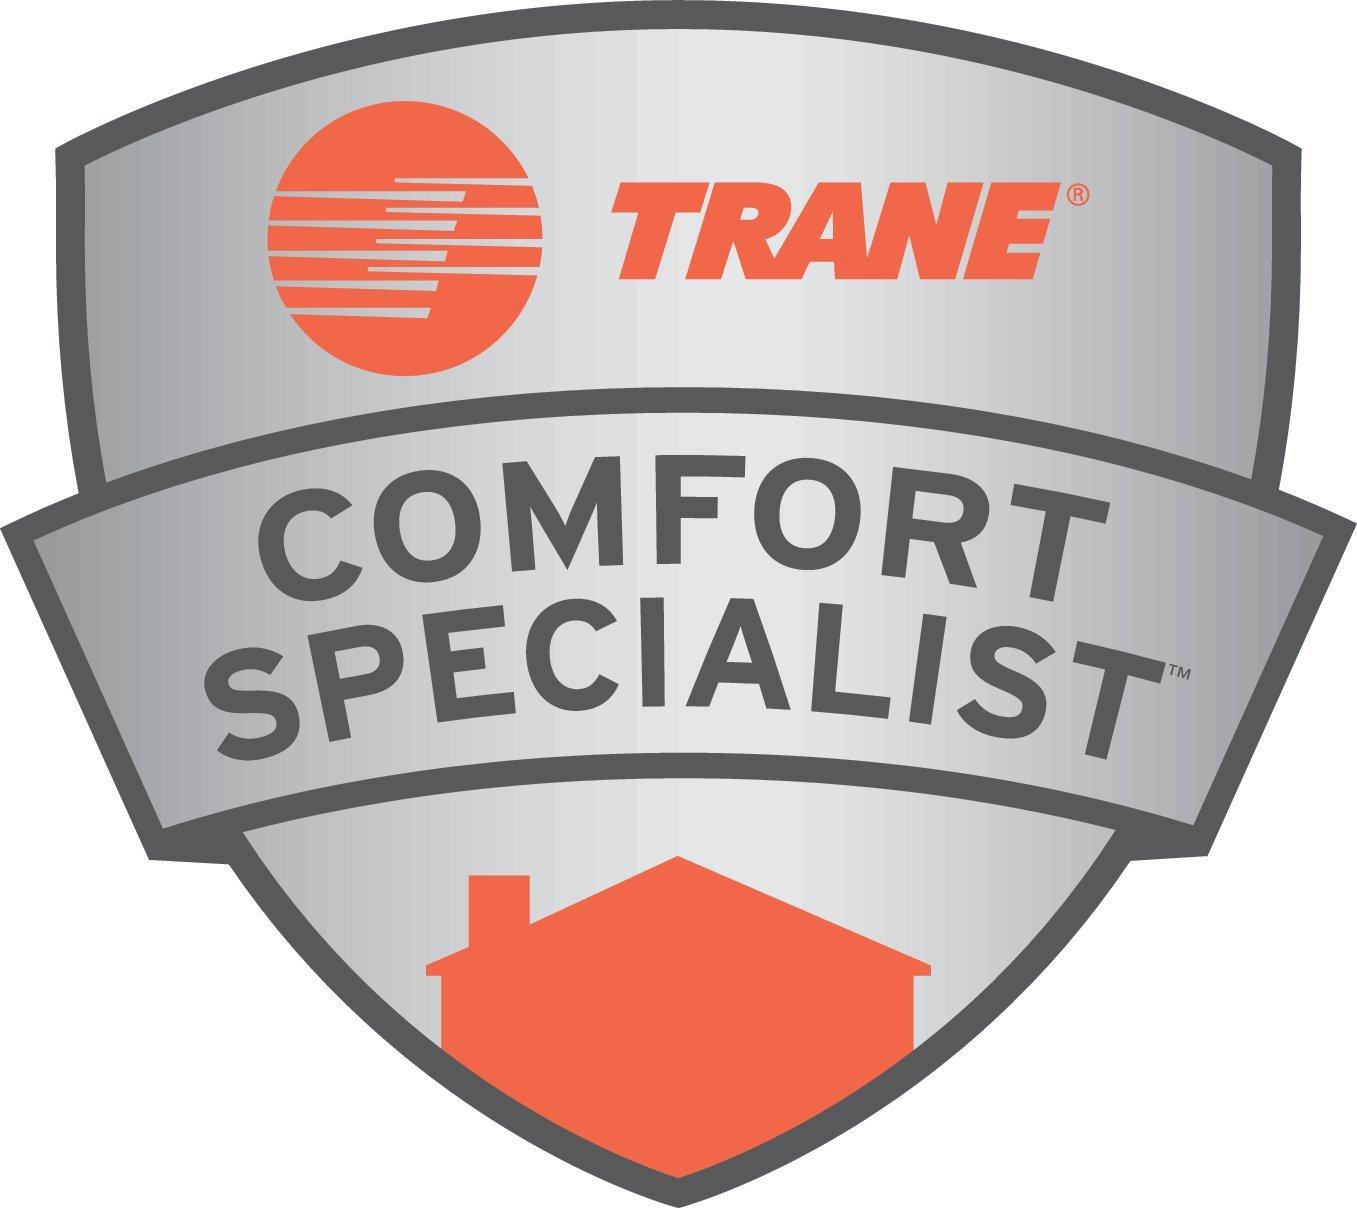 Trane Comfort Specialist seal